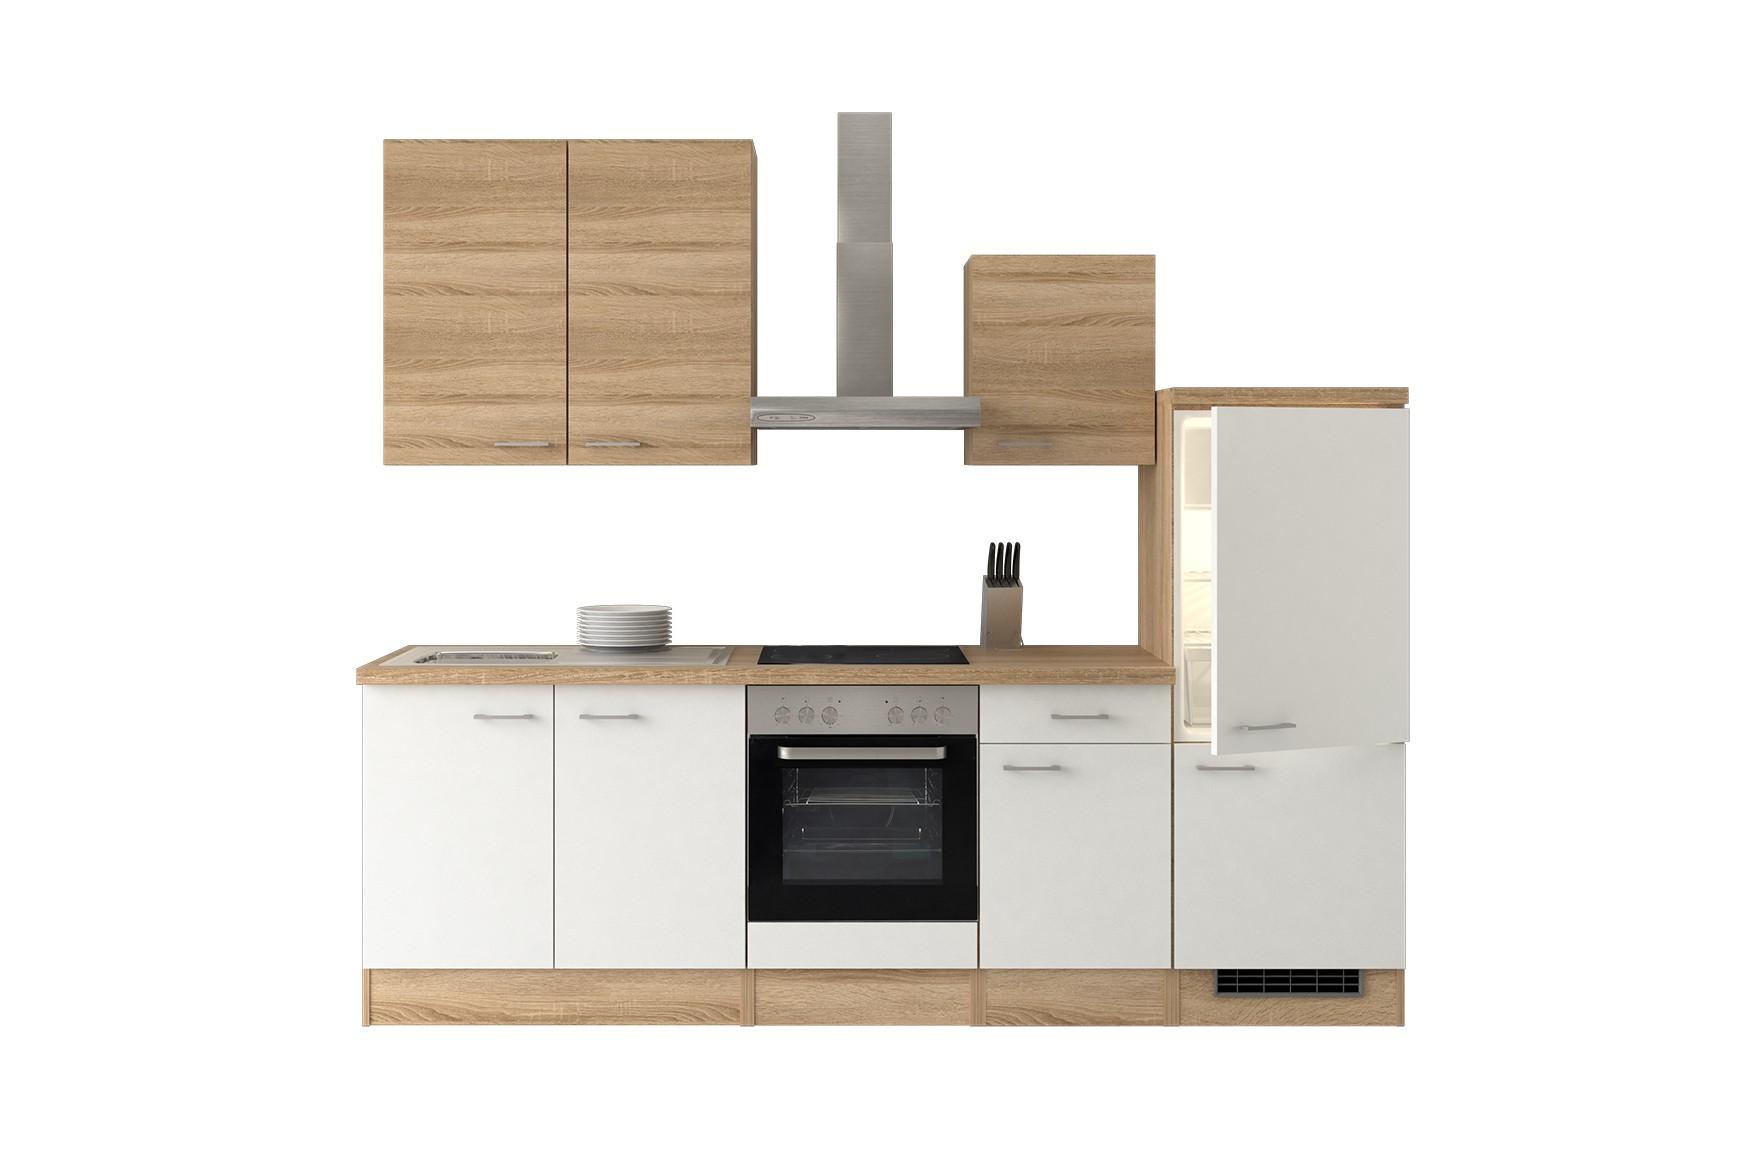 k che rom k chenzeile k chenblock mit elektroger ten 270. Black Bedroom Furniture Sets. Home Design Ideas